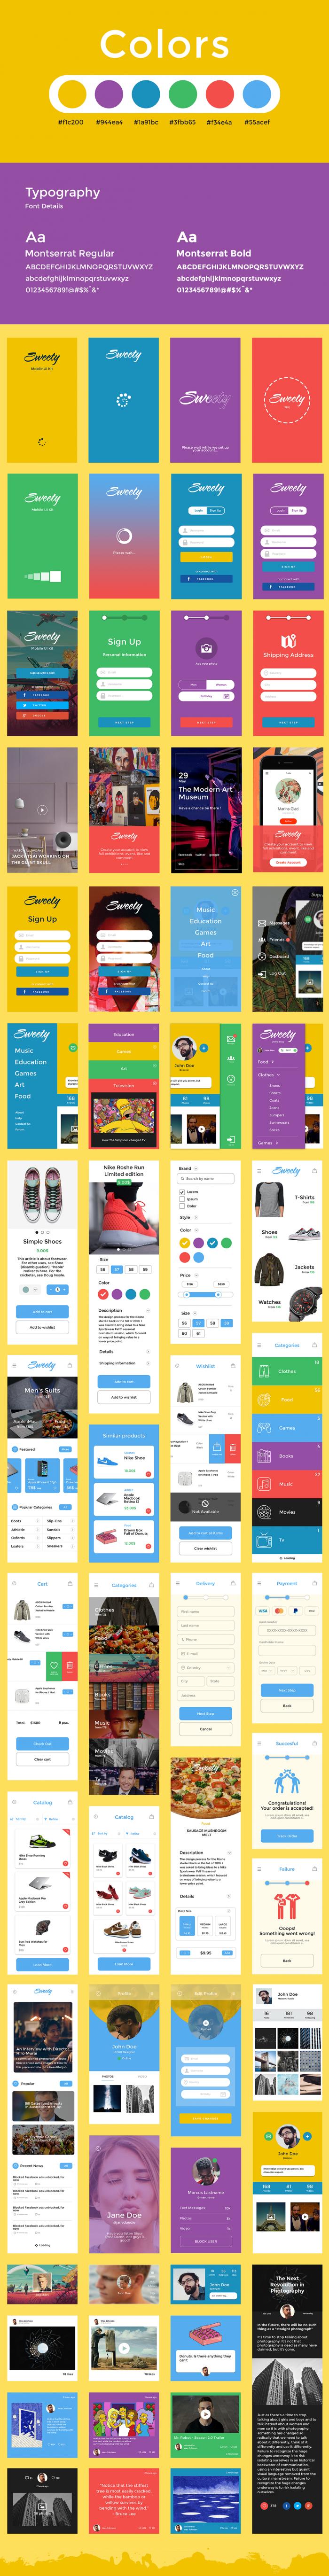 Sweety iOS UI Kit (.Psd) скачать бесплатно